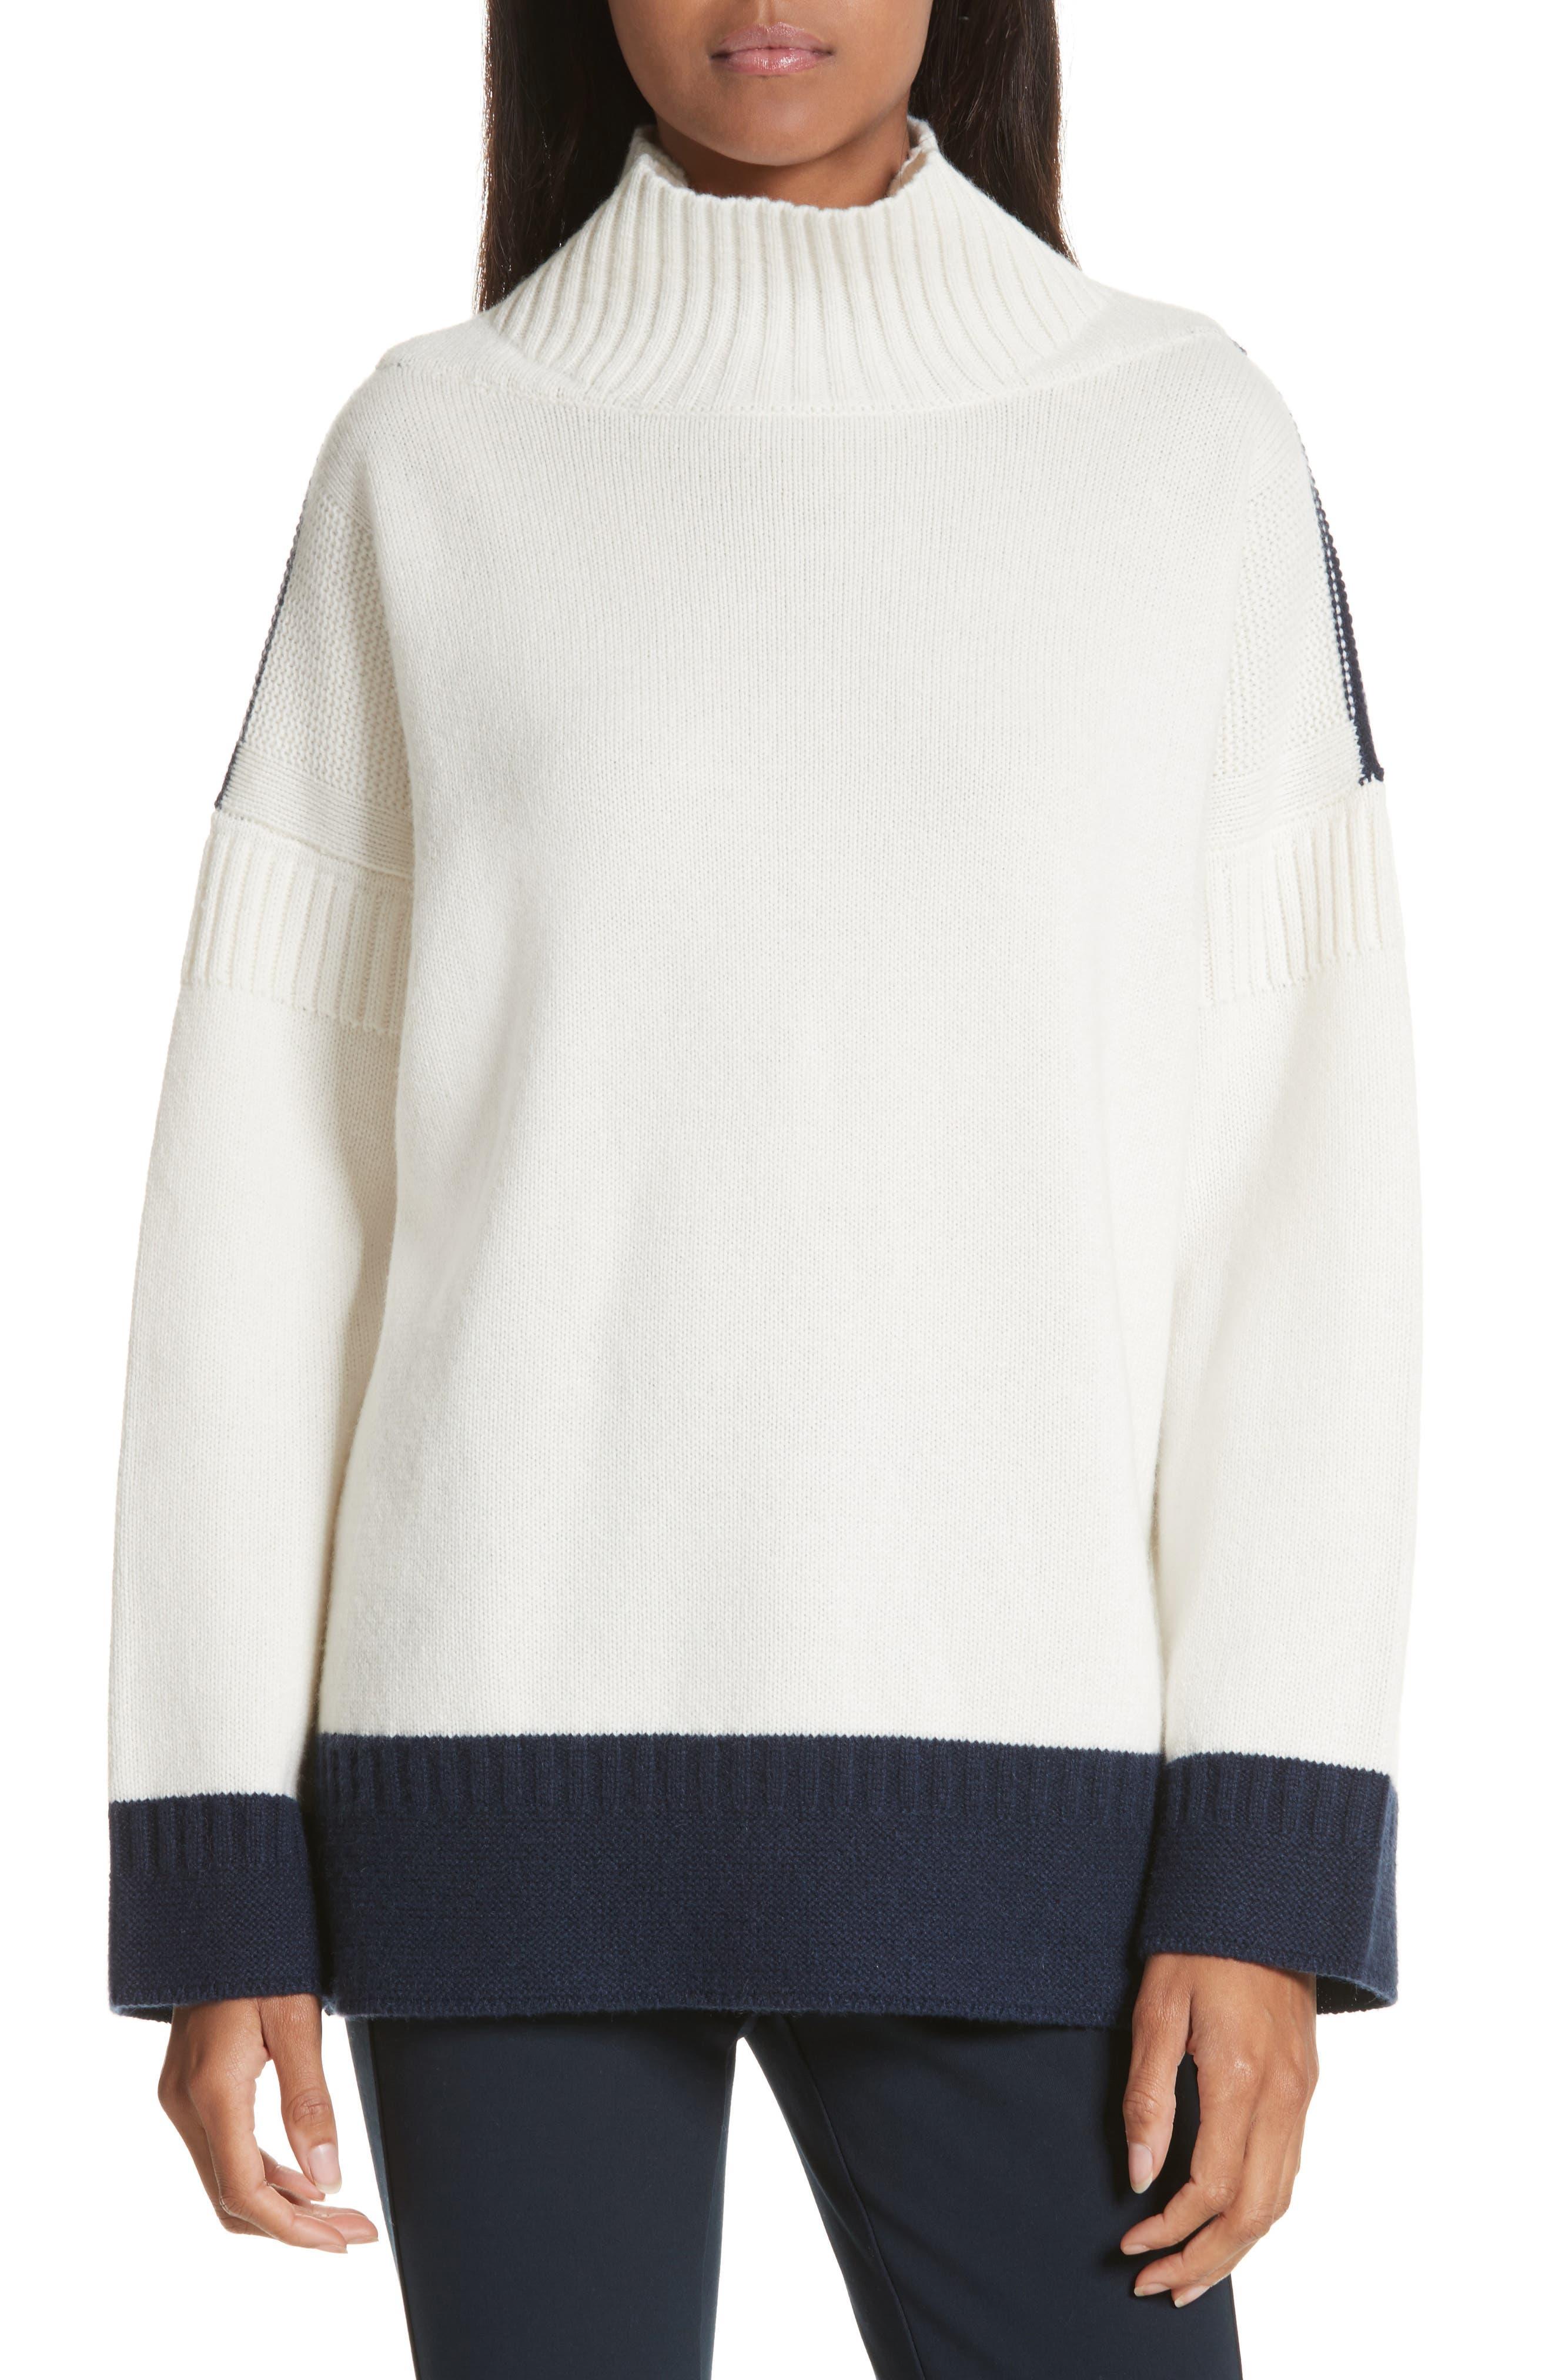 Alternate Image 1 Selected - rag & bone Aubree Funnel Neck Cashmere Sweater